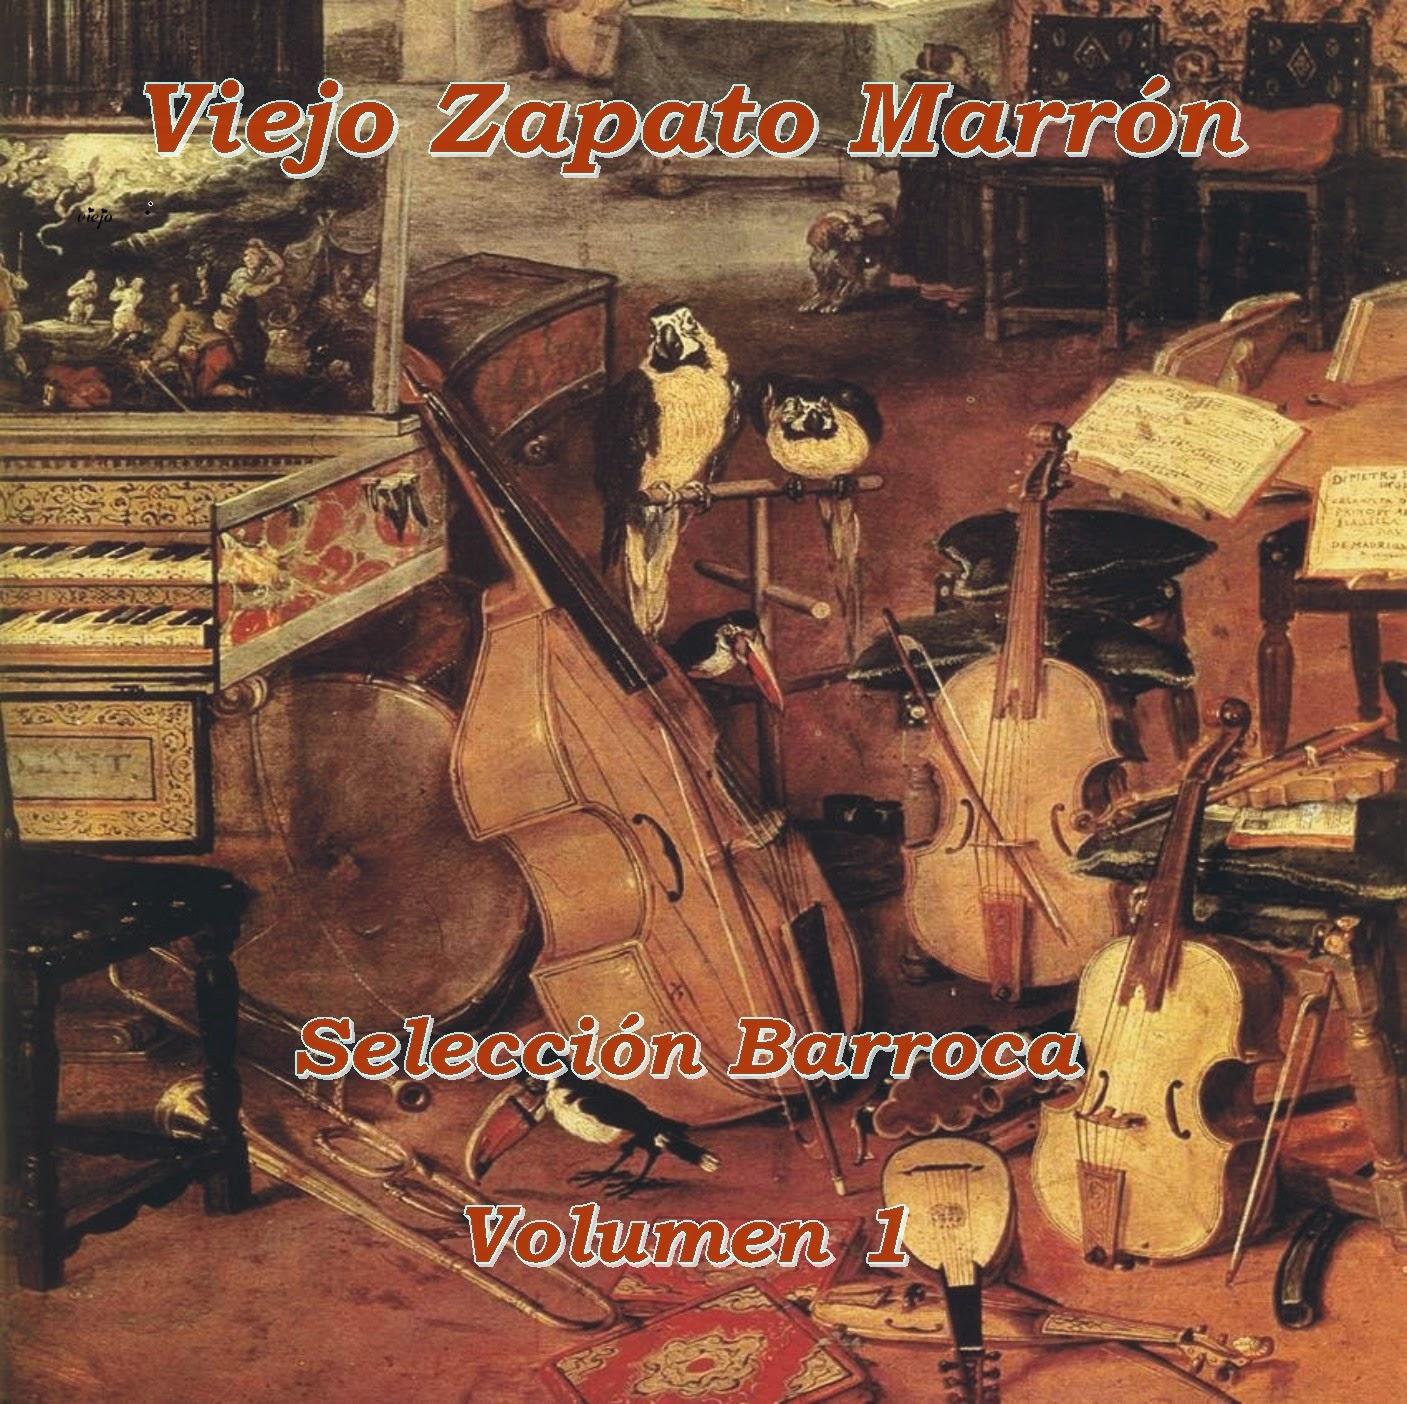 Selección Barroca, volumen 1